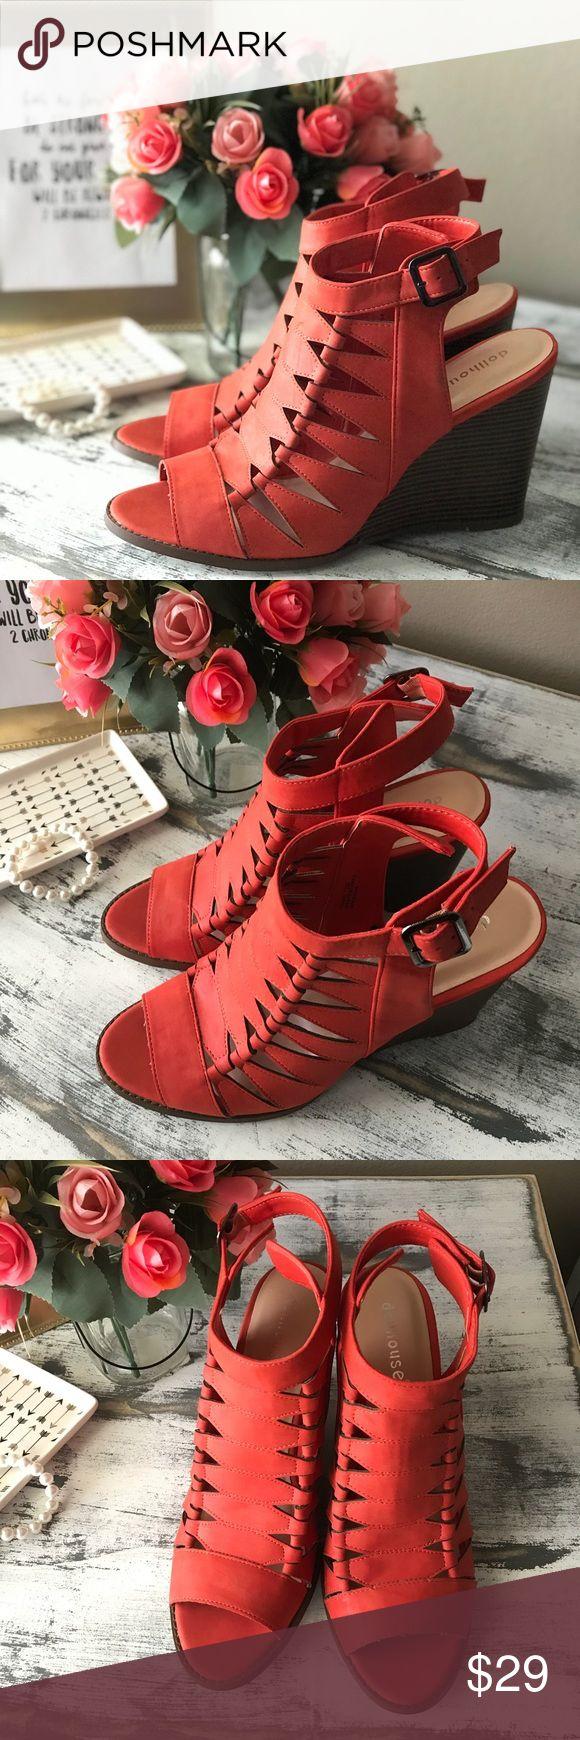 "Dollhouse Caged burnt orange wedges sz 12M Minor wear on bottom of wedges  4.5"" wedge 3.5"" Width Adjustable Dollhouse Shoes Wedges"